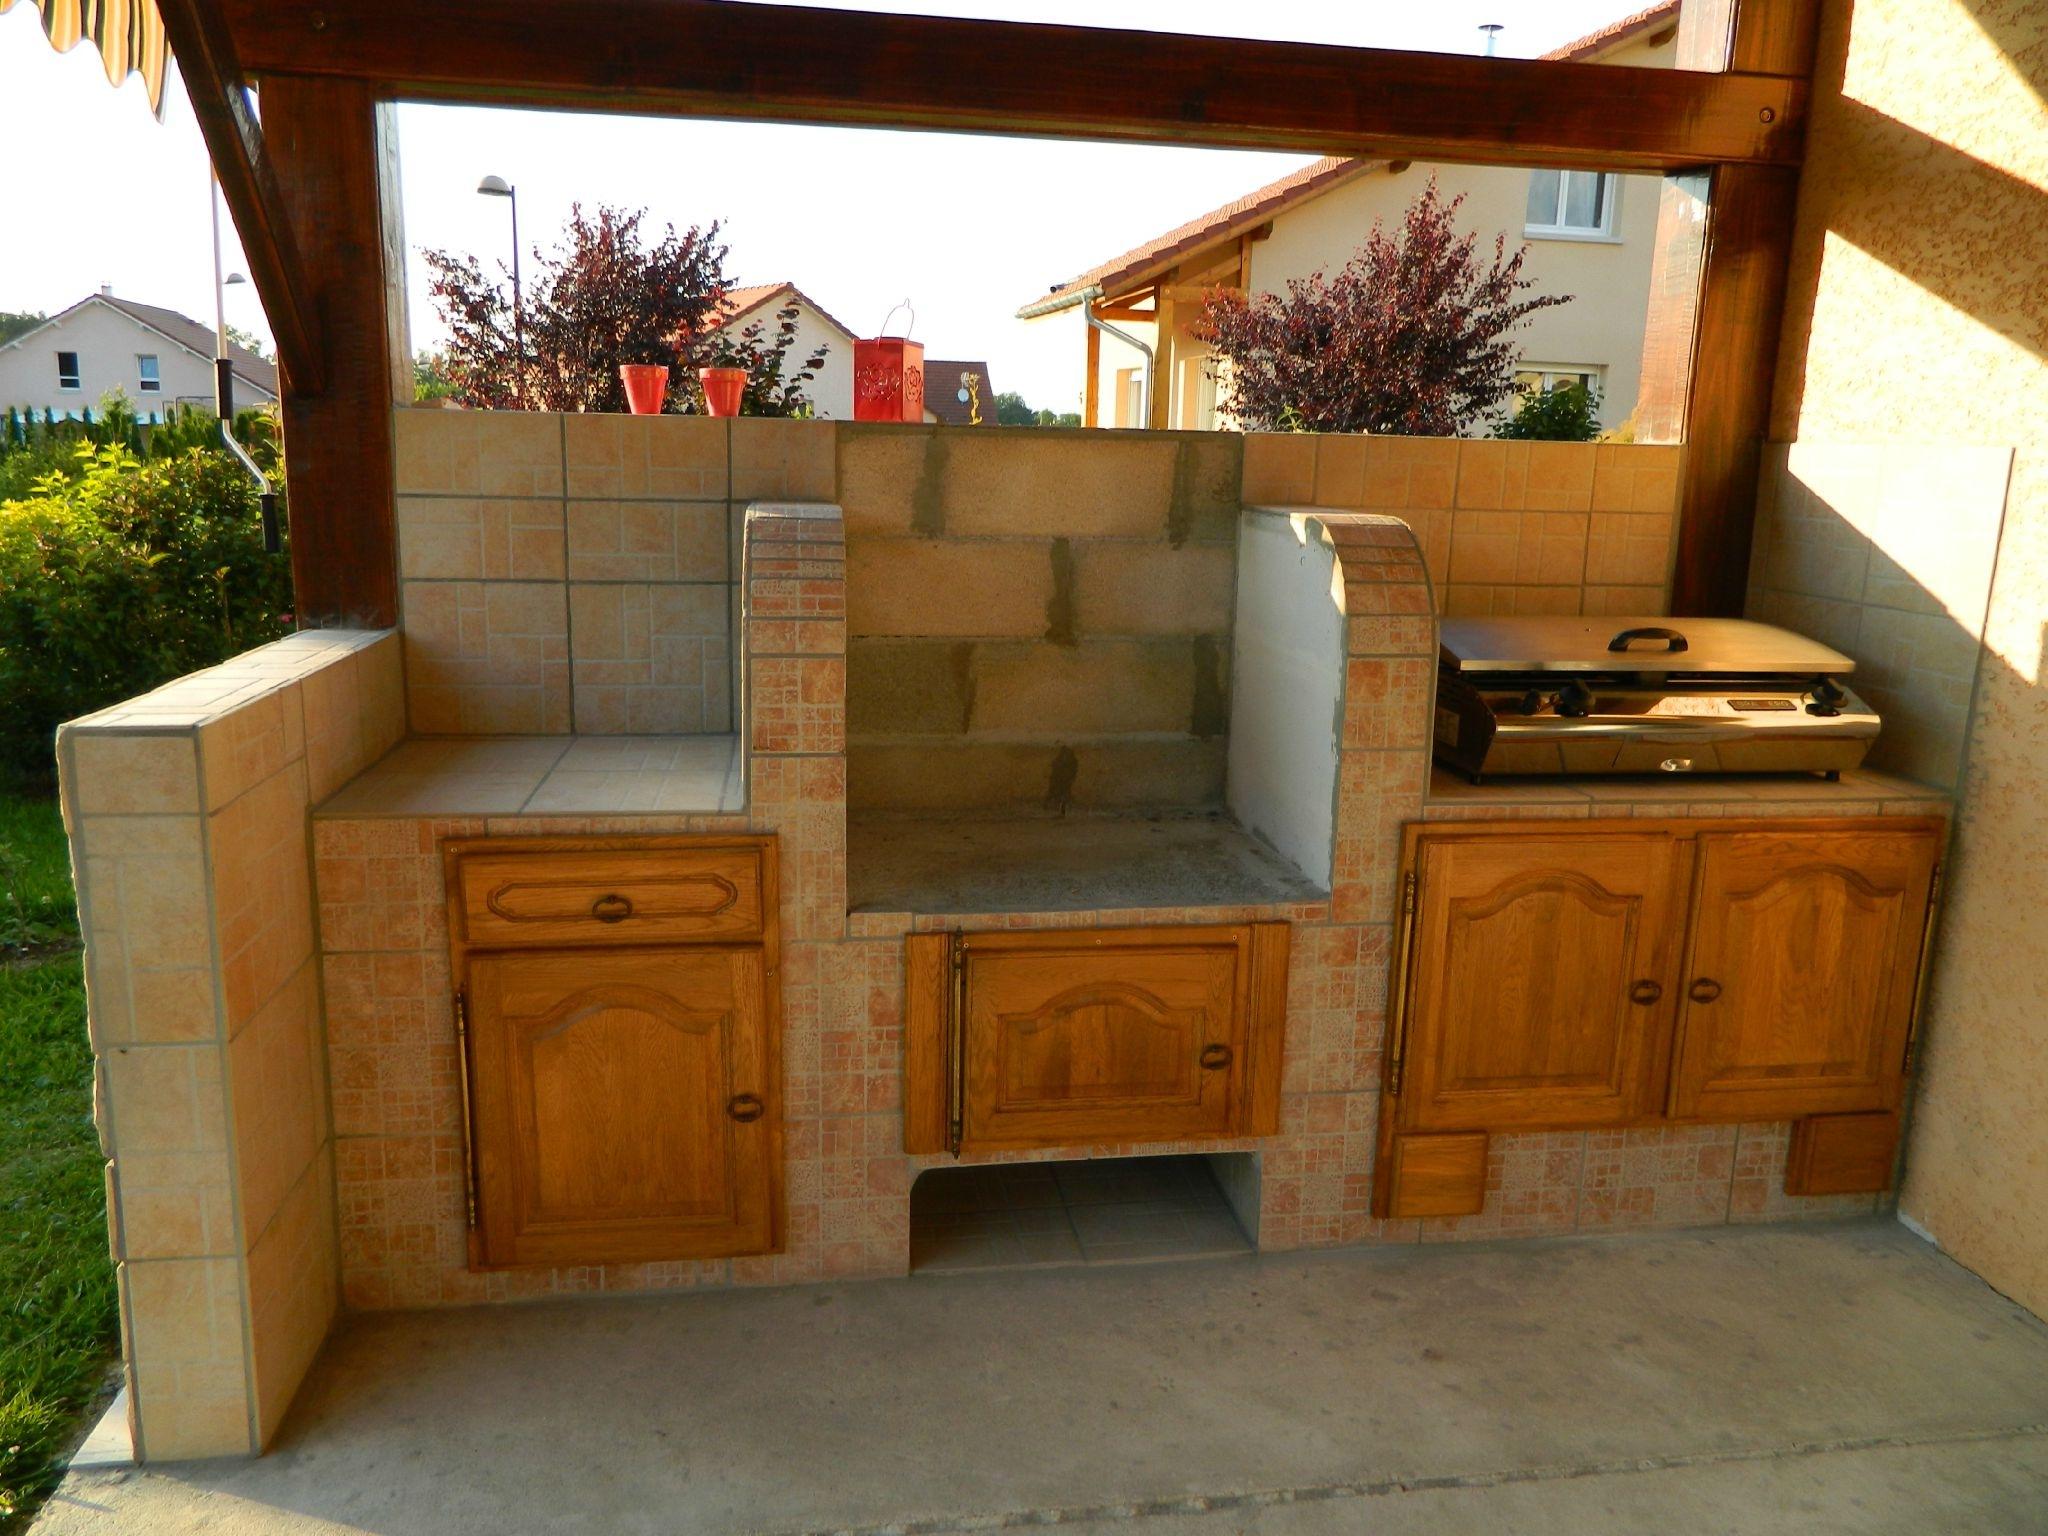 Construire cuisine exterieure beton - Construire cuisine ...